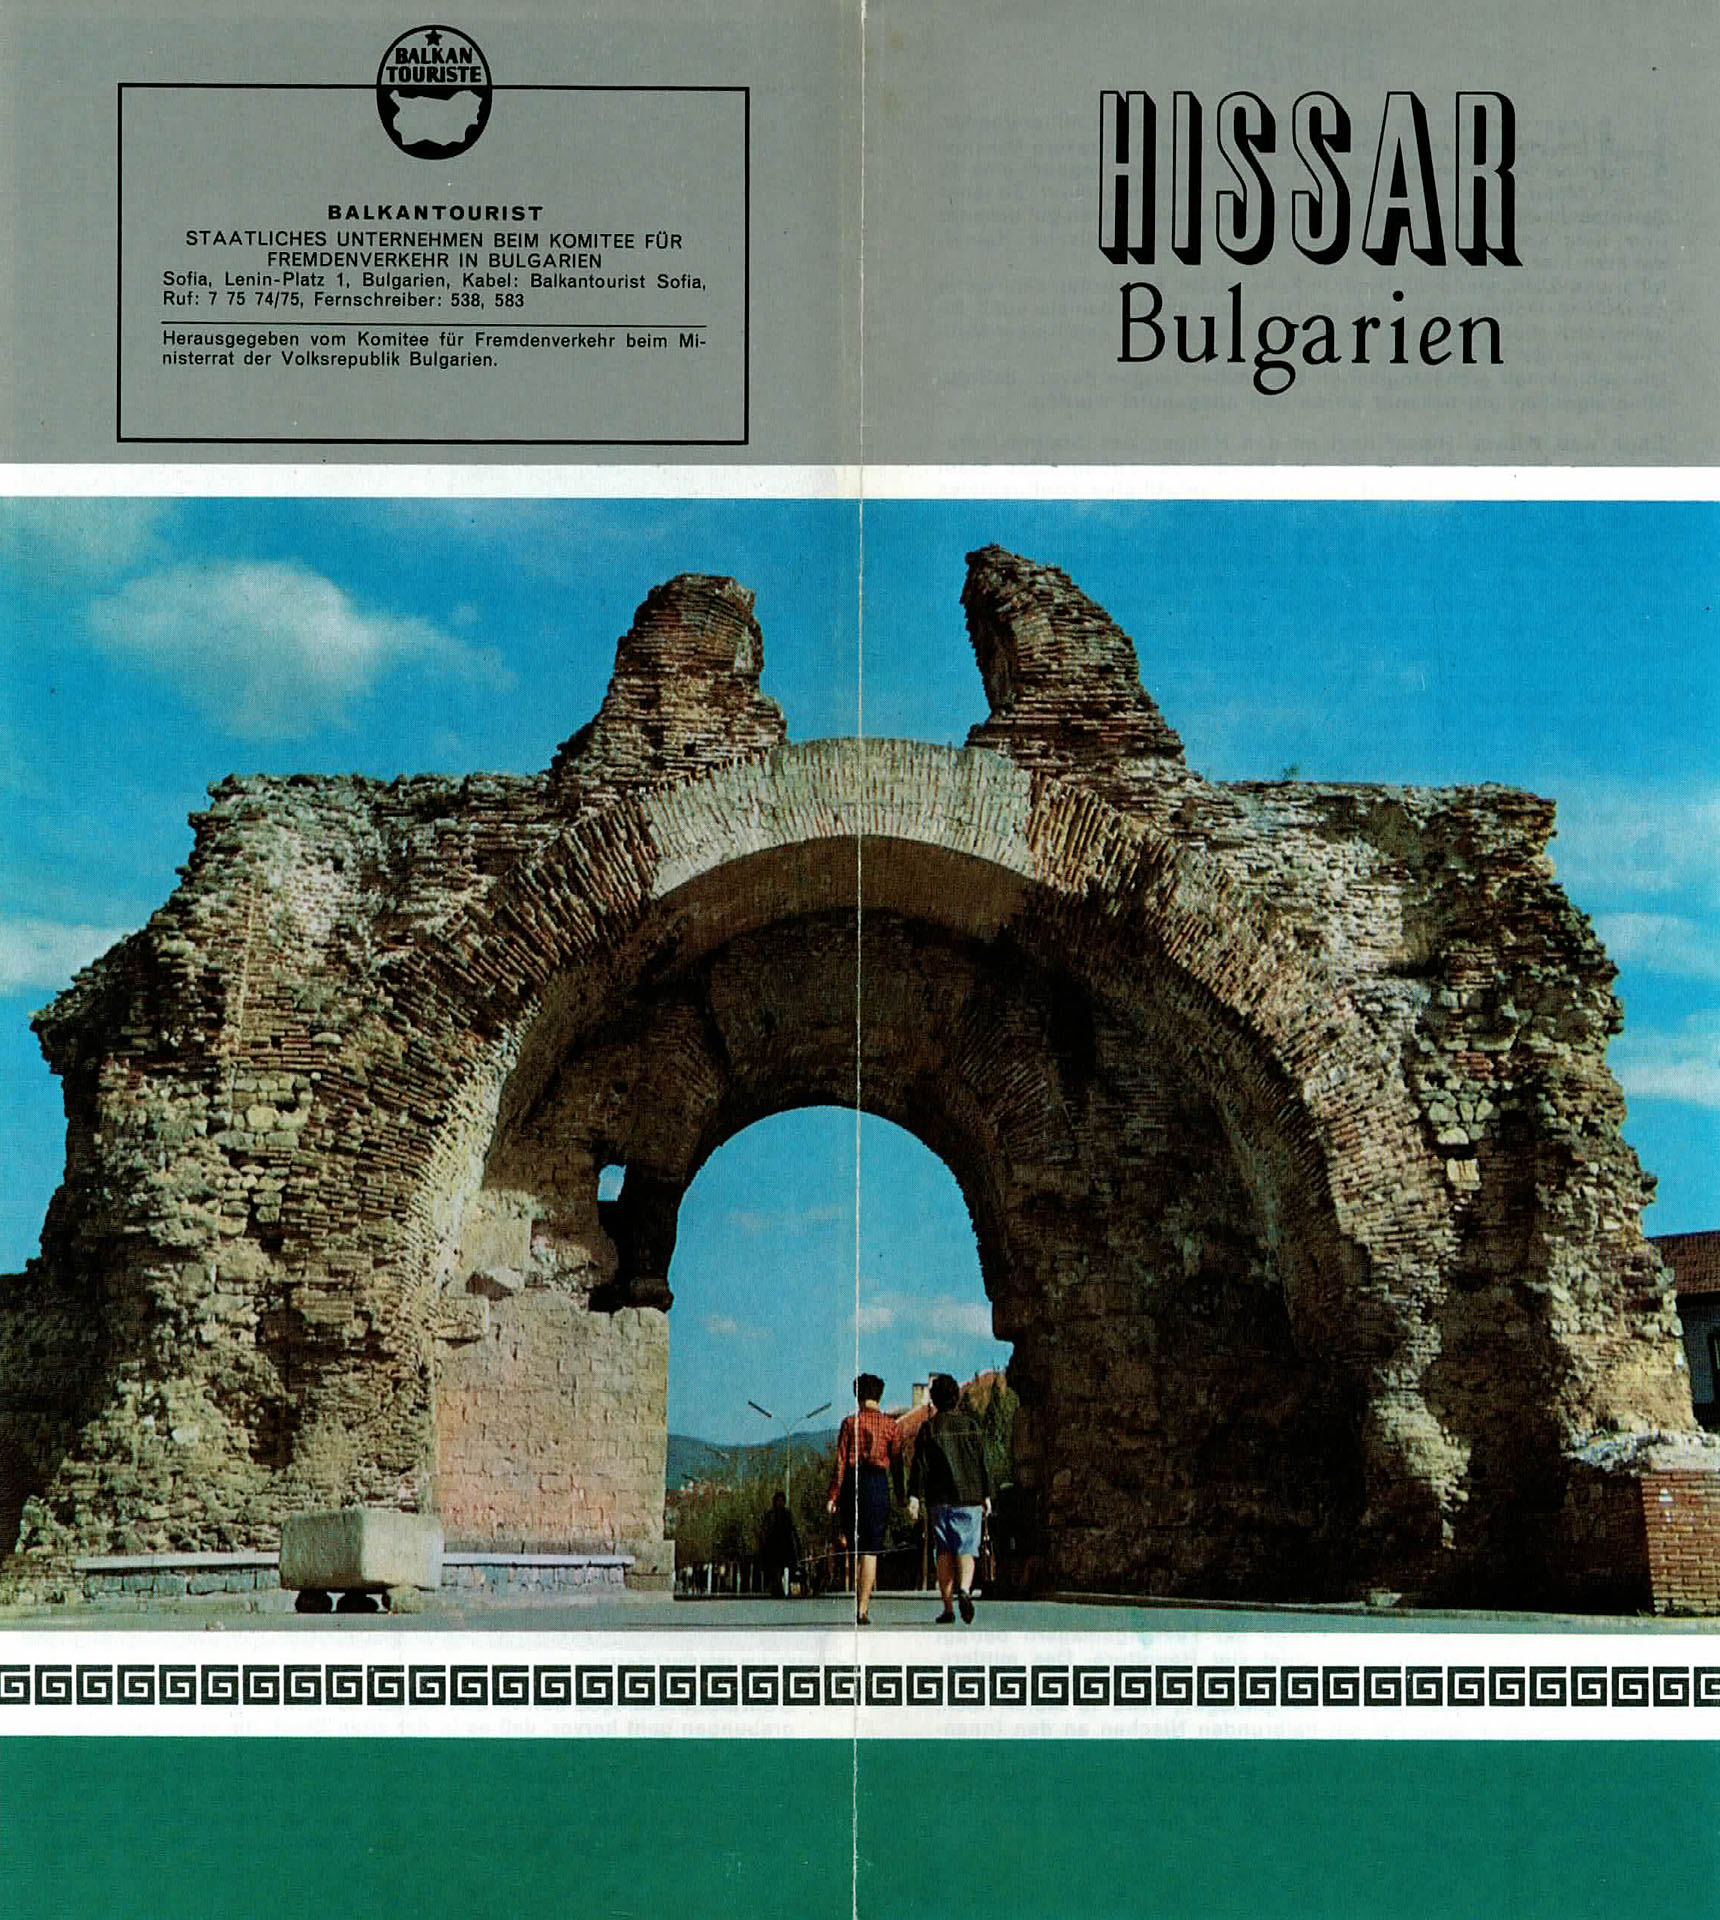 Hissar - Bulgarien - Balkantourist